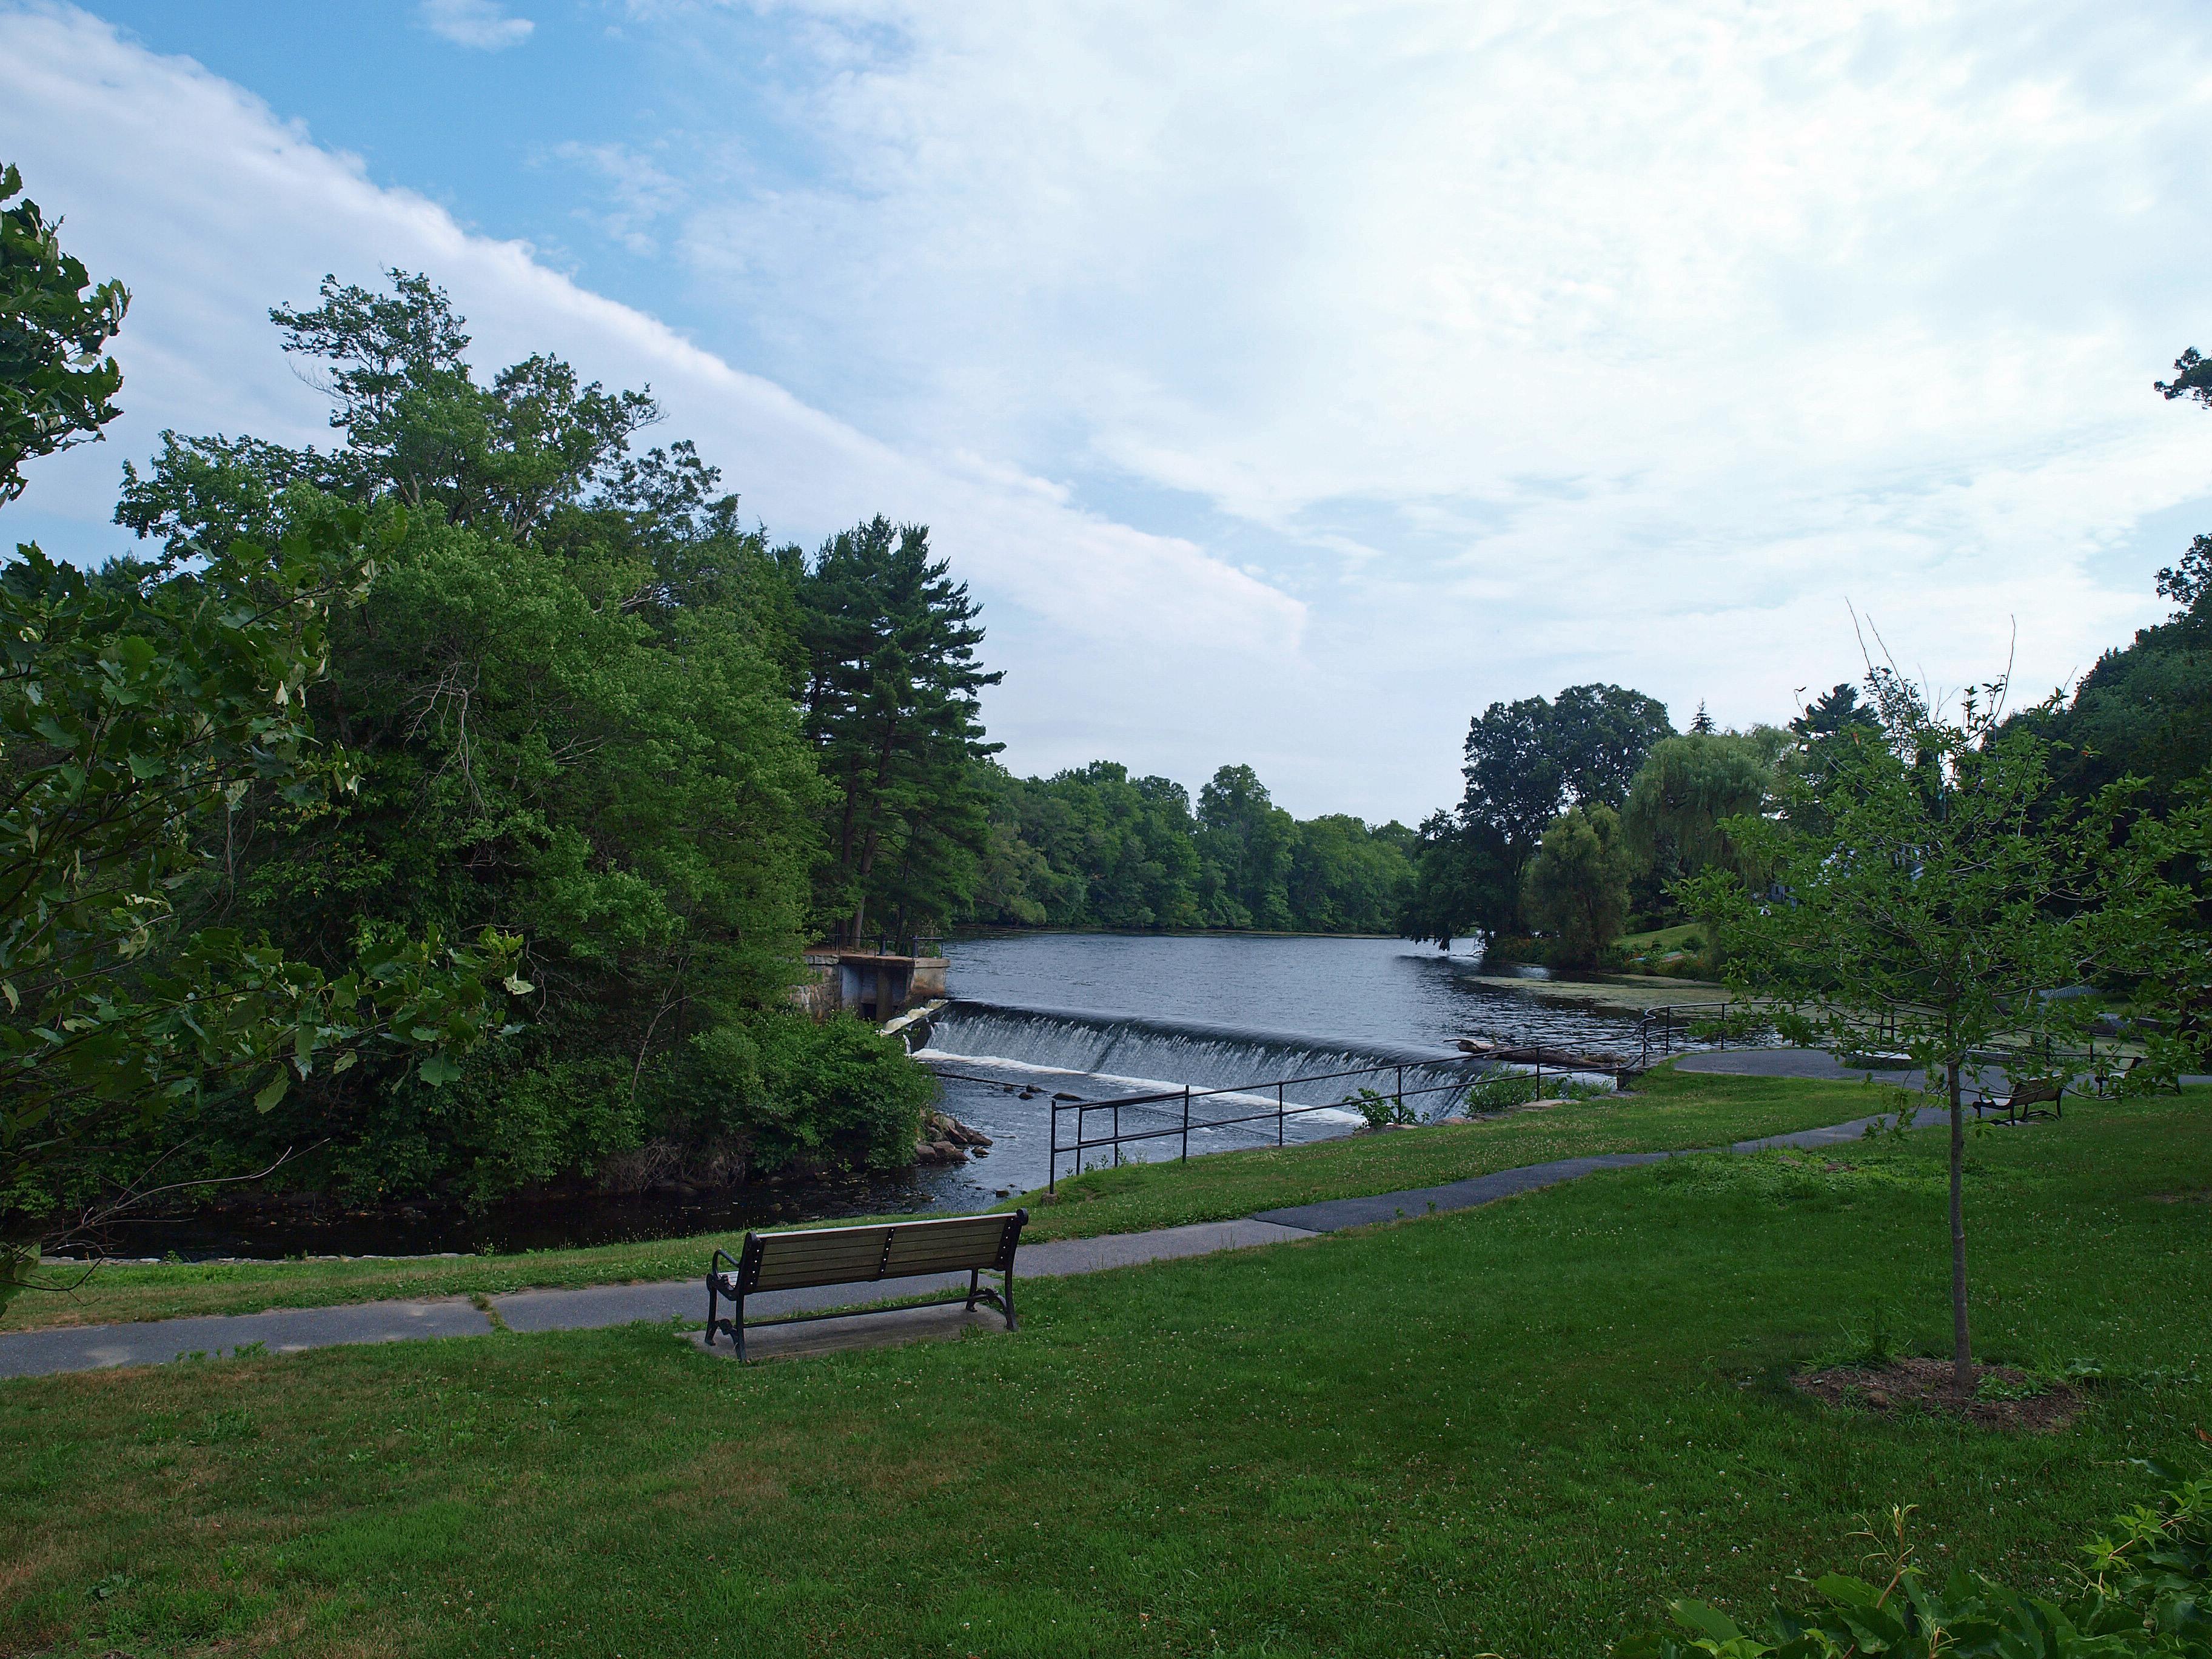 Charles River Dam, South Natick